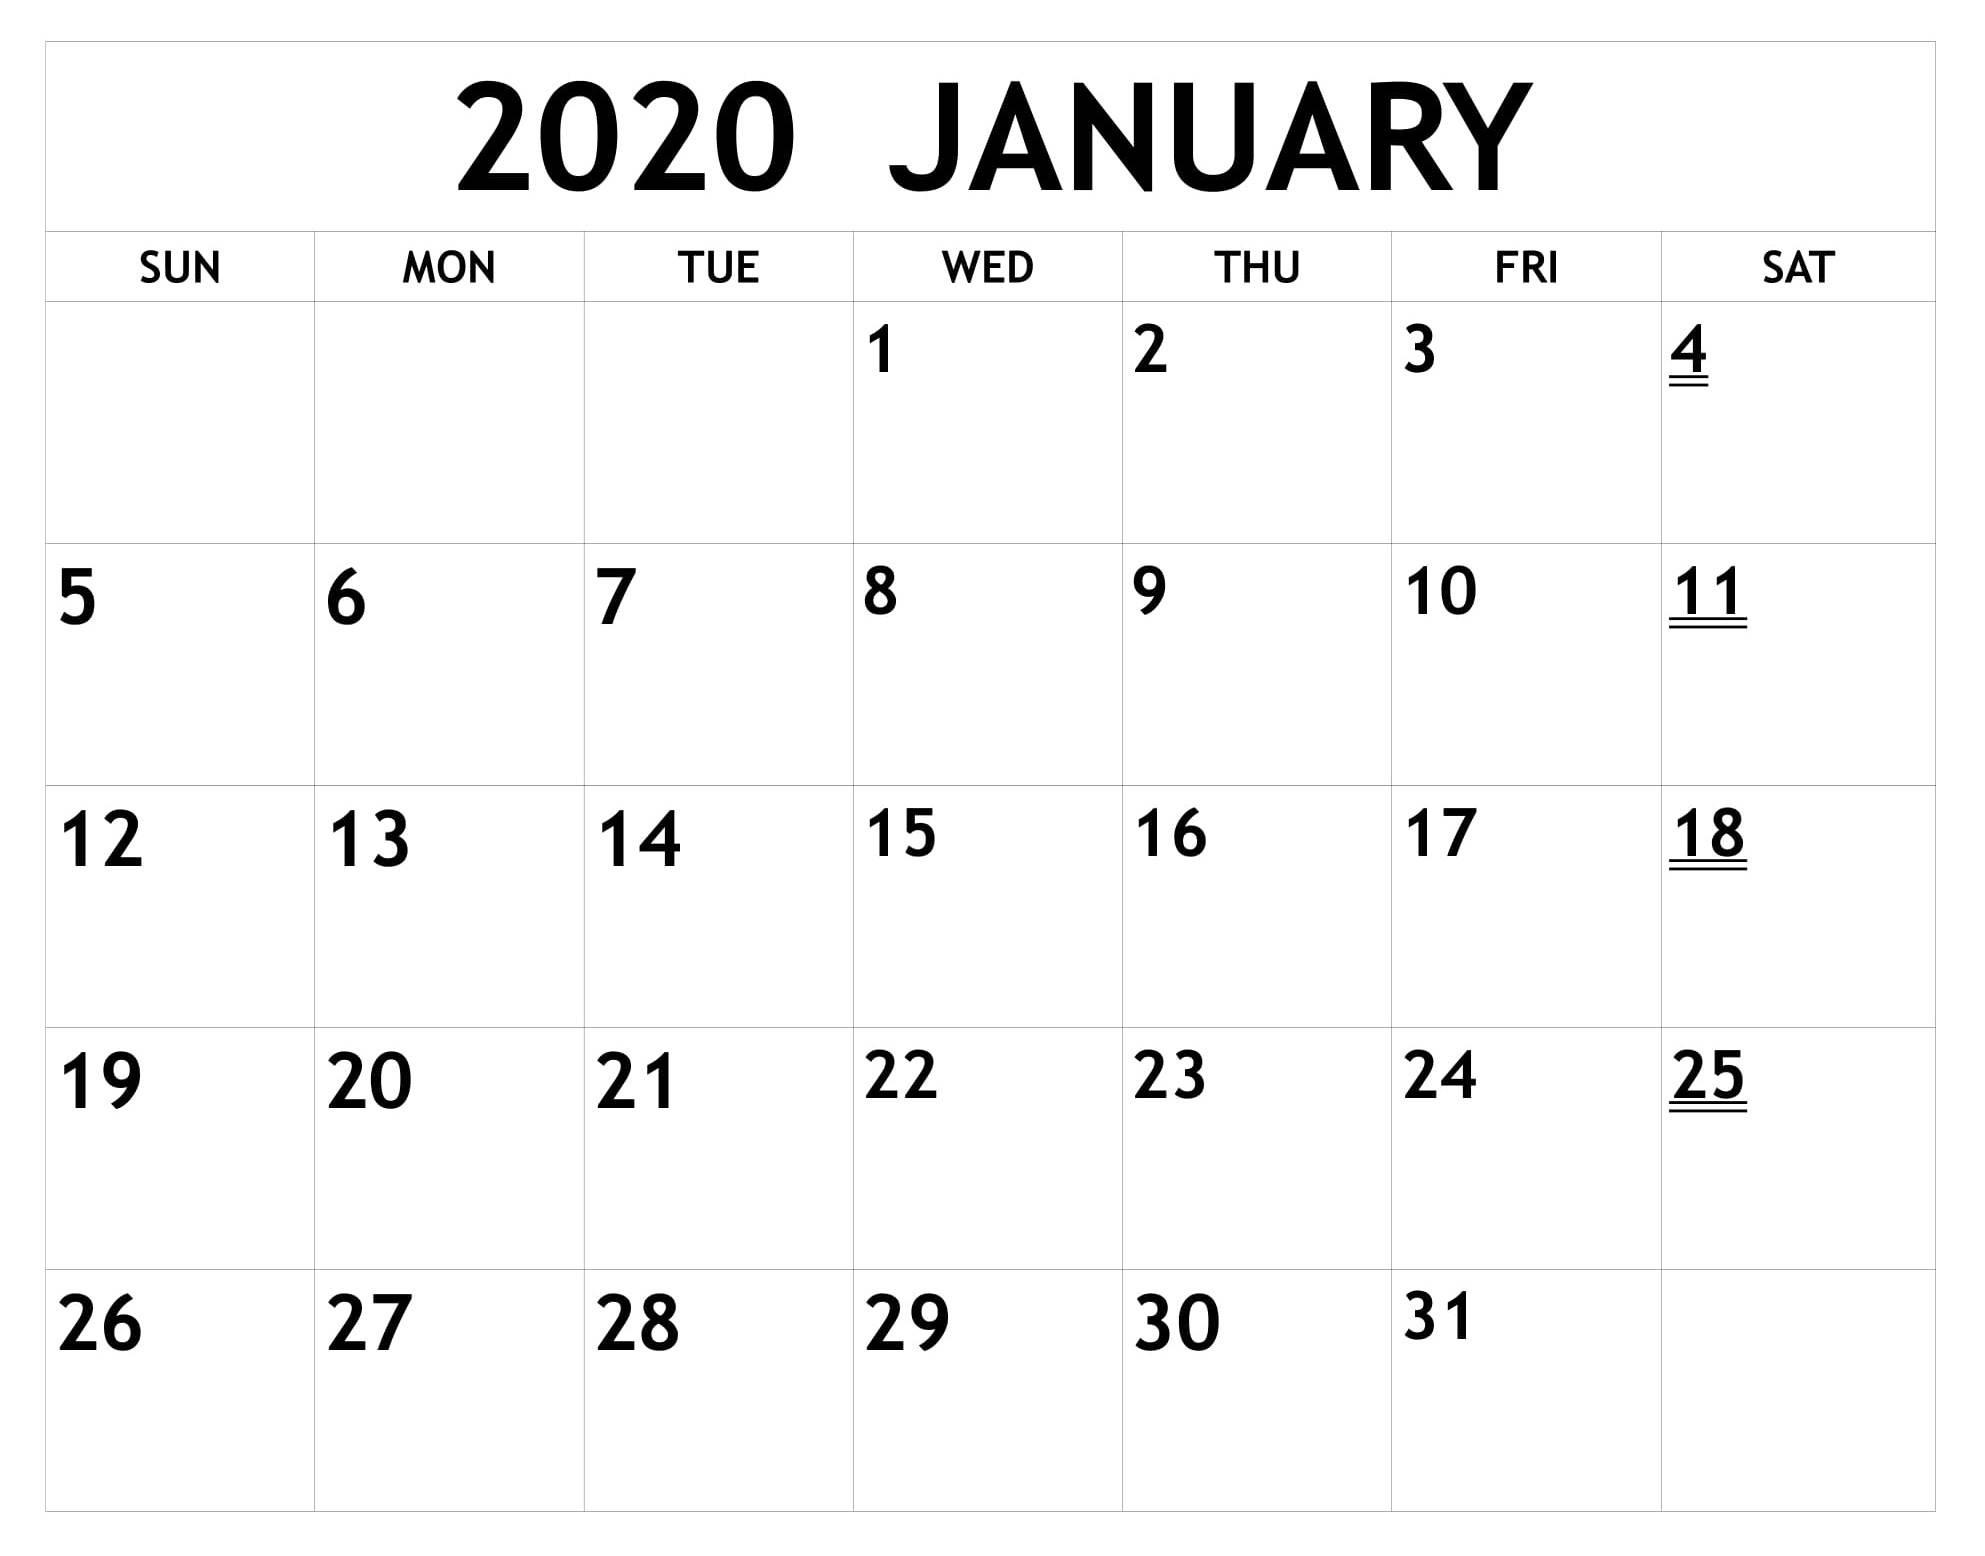 Printable January Calendar 2020 Word - 2019 Calendars For